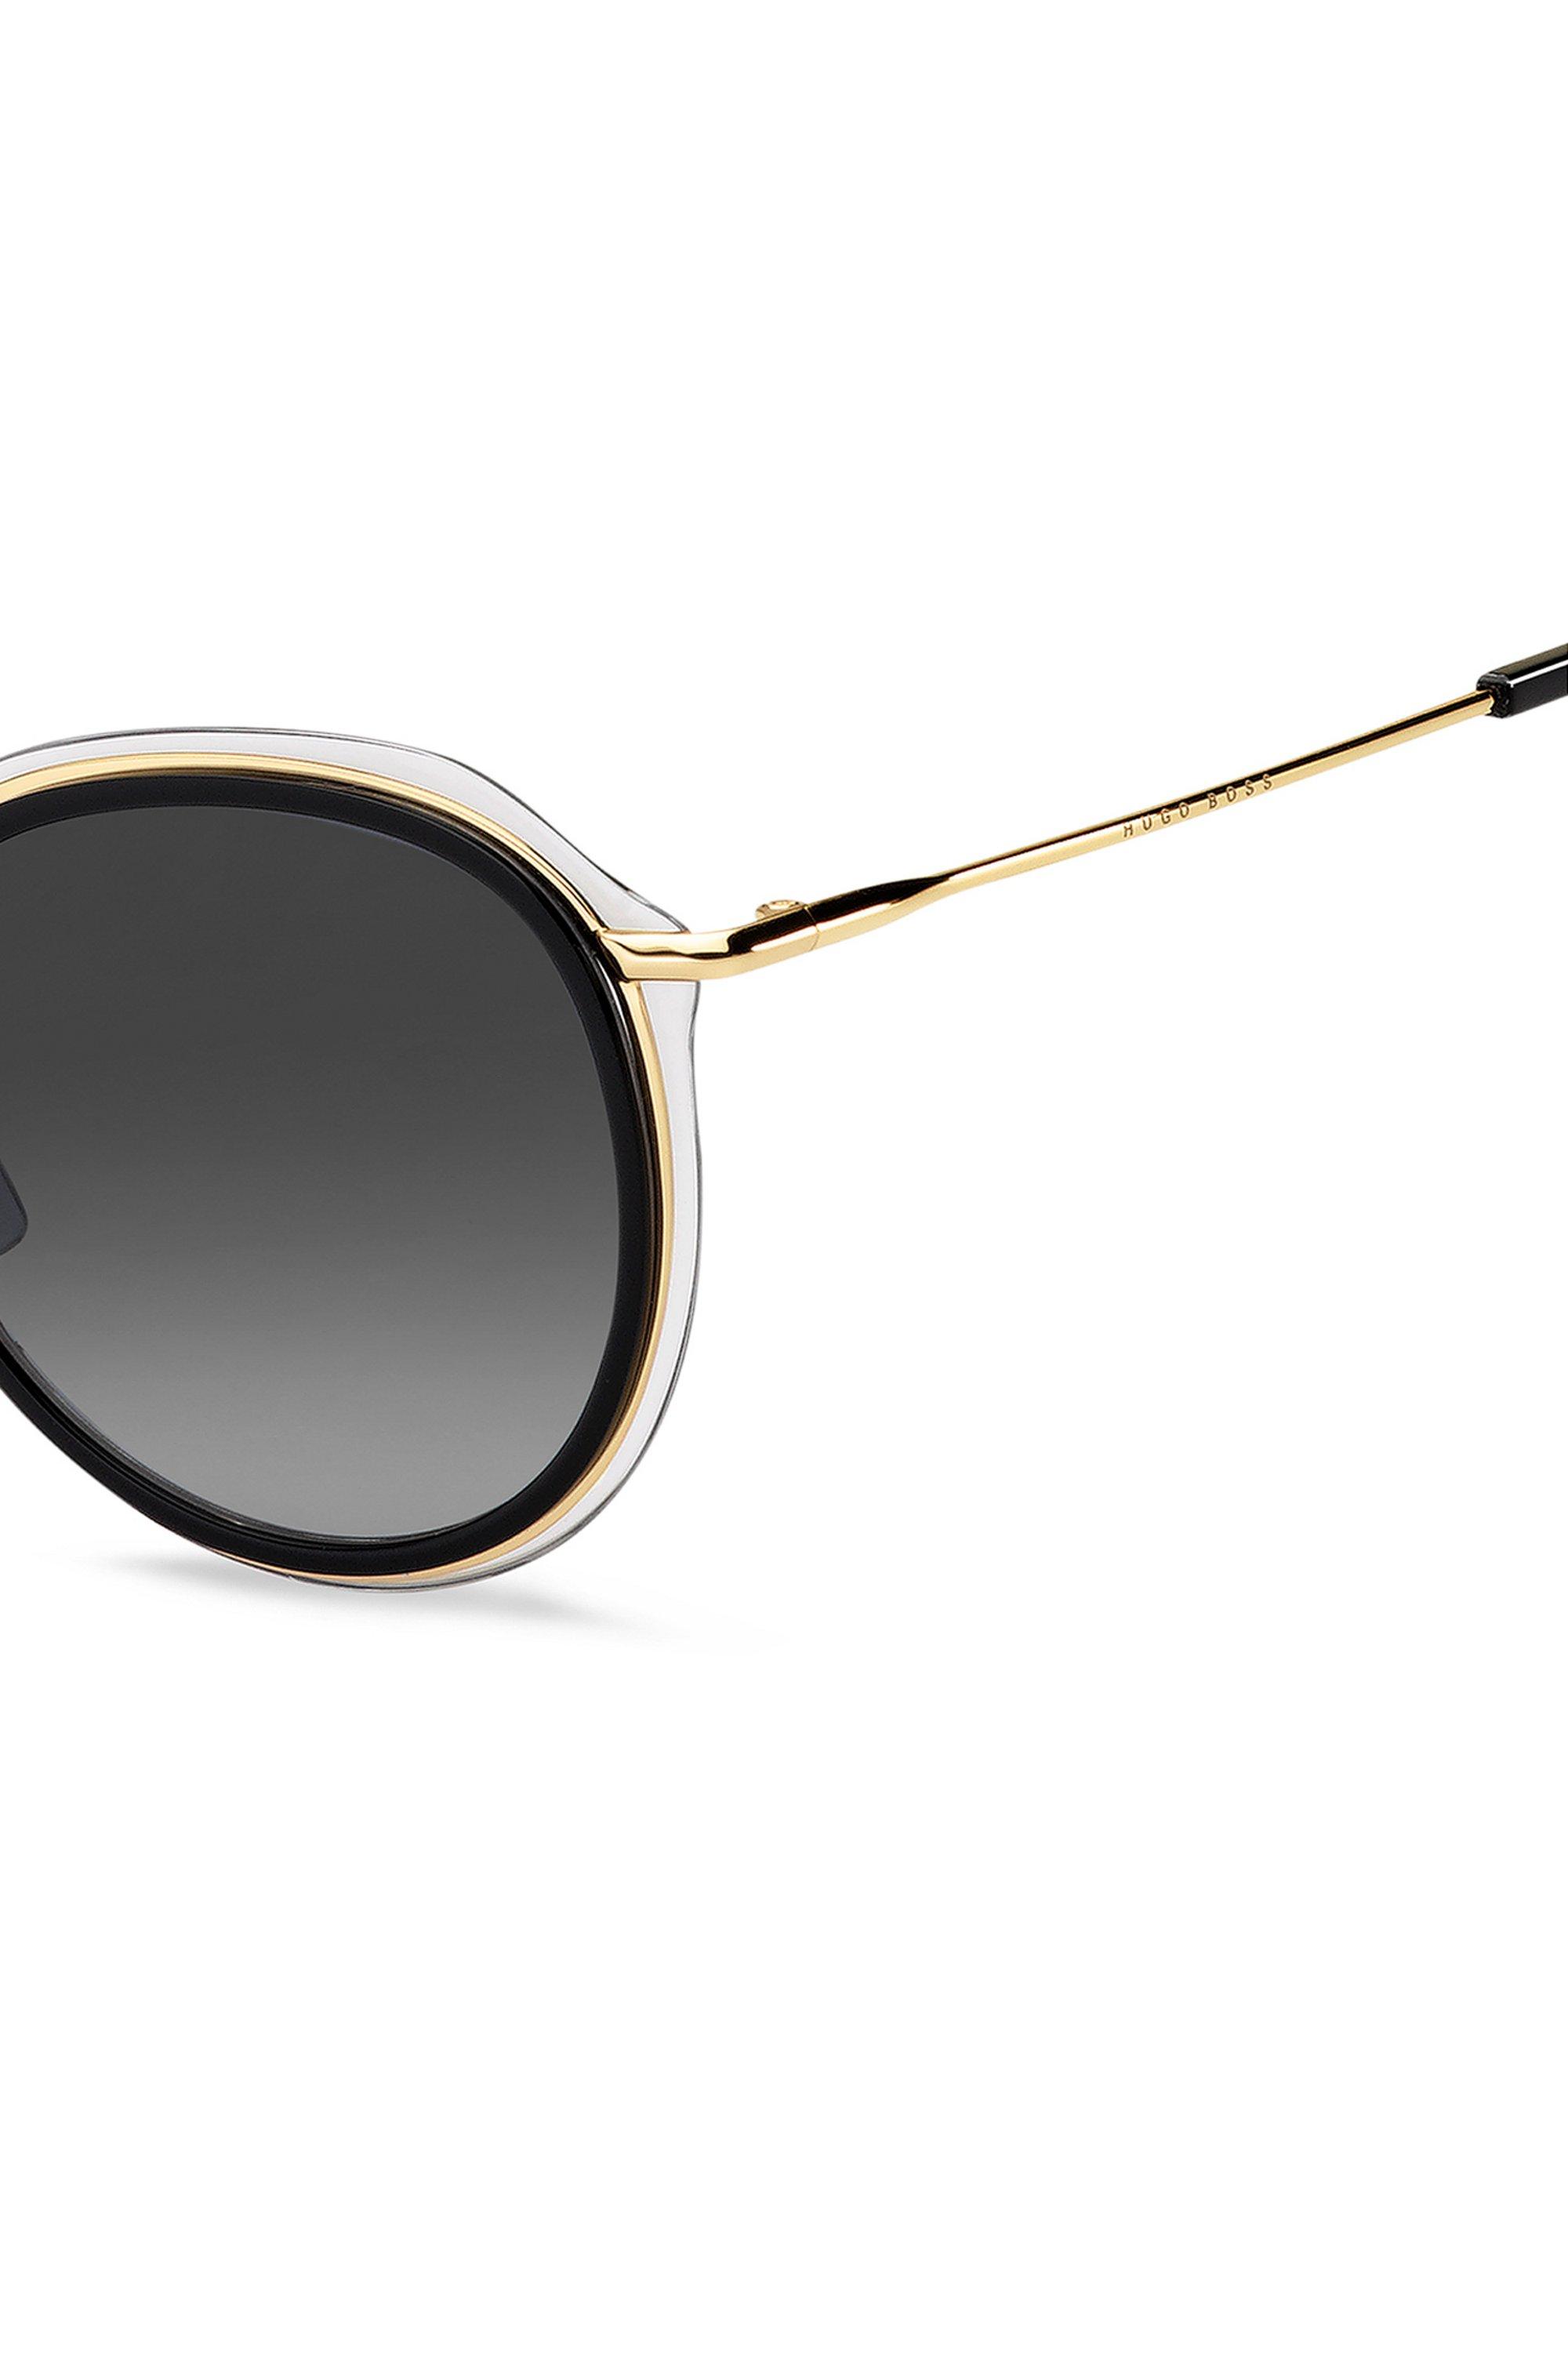 Hybrid sunglasses in gold-tone metal and black acetate